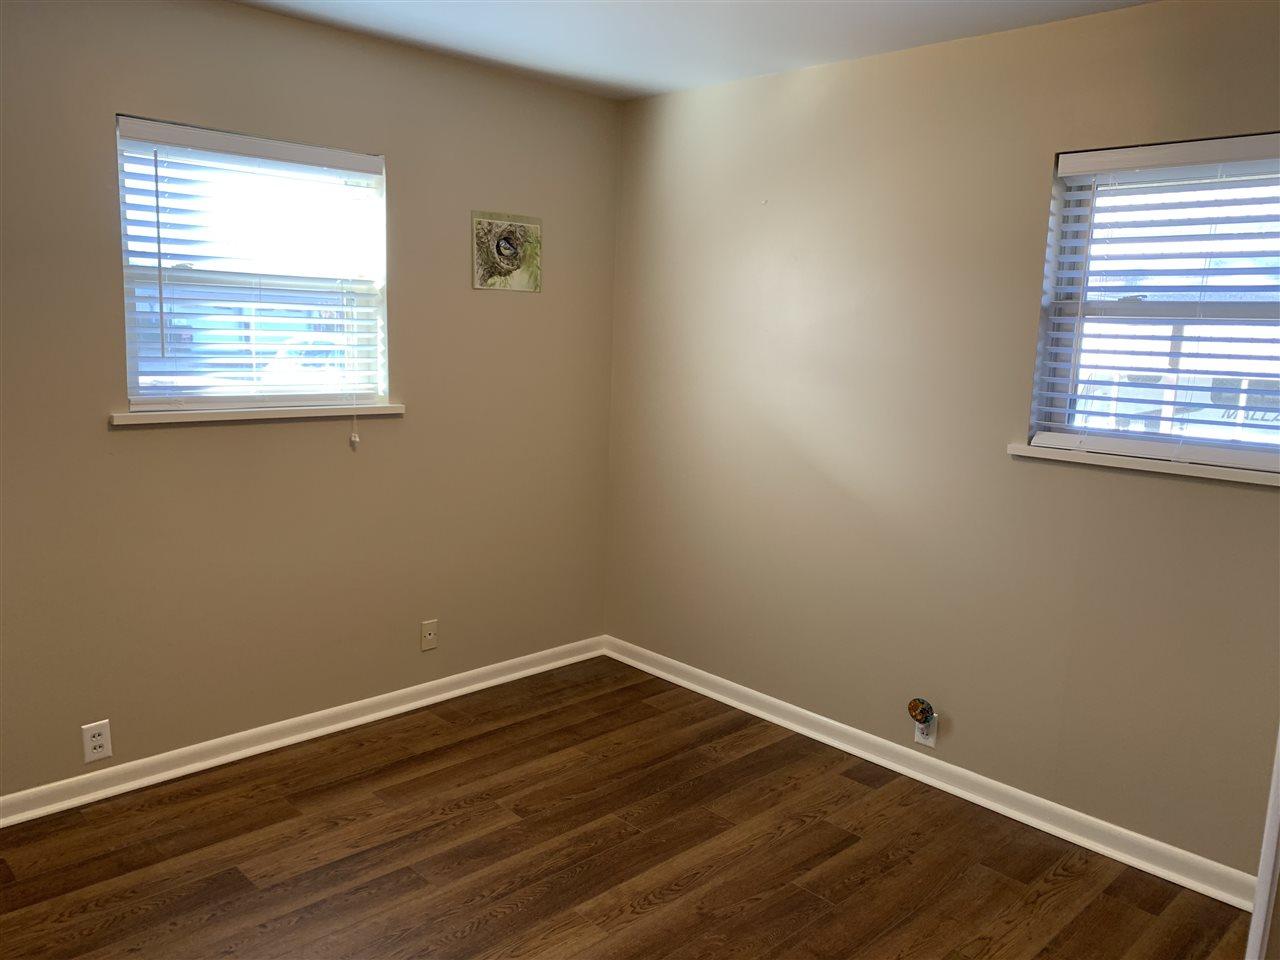 Sold Intraoffice W/MLS   114 S Peach Newkirk, OK 74647 20